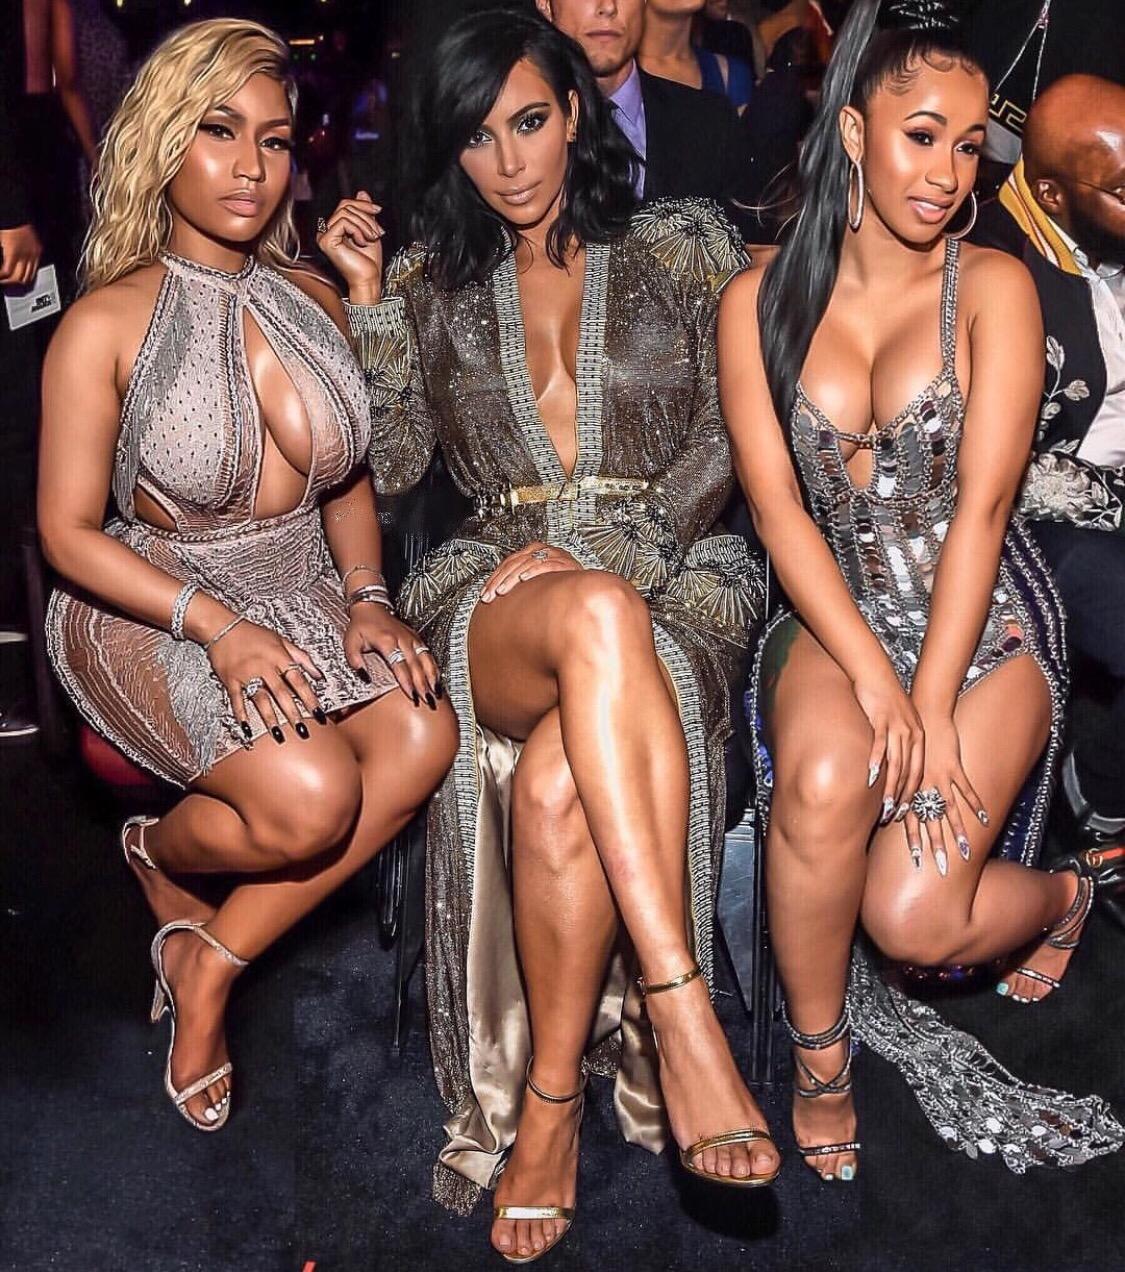 Cardi B joins Kris Jenner's rich people's club